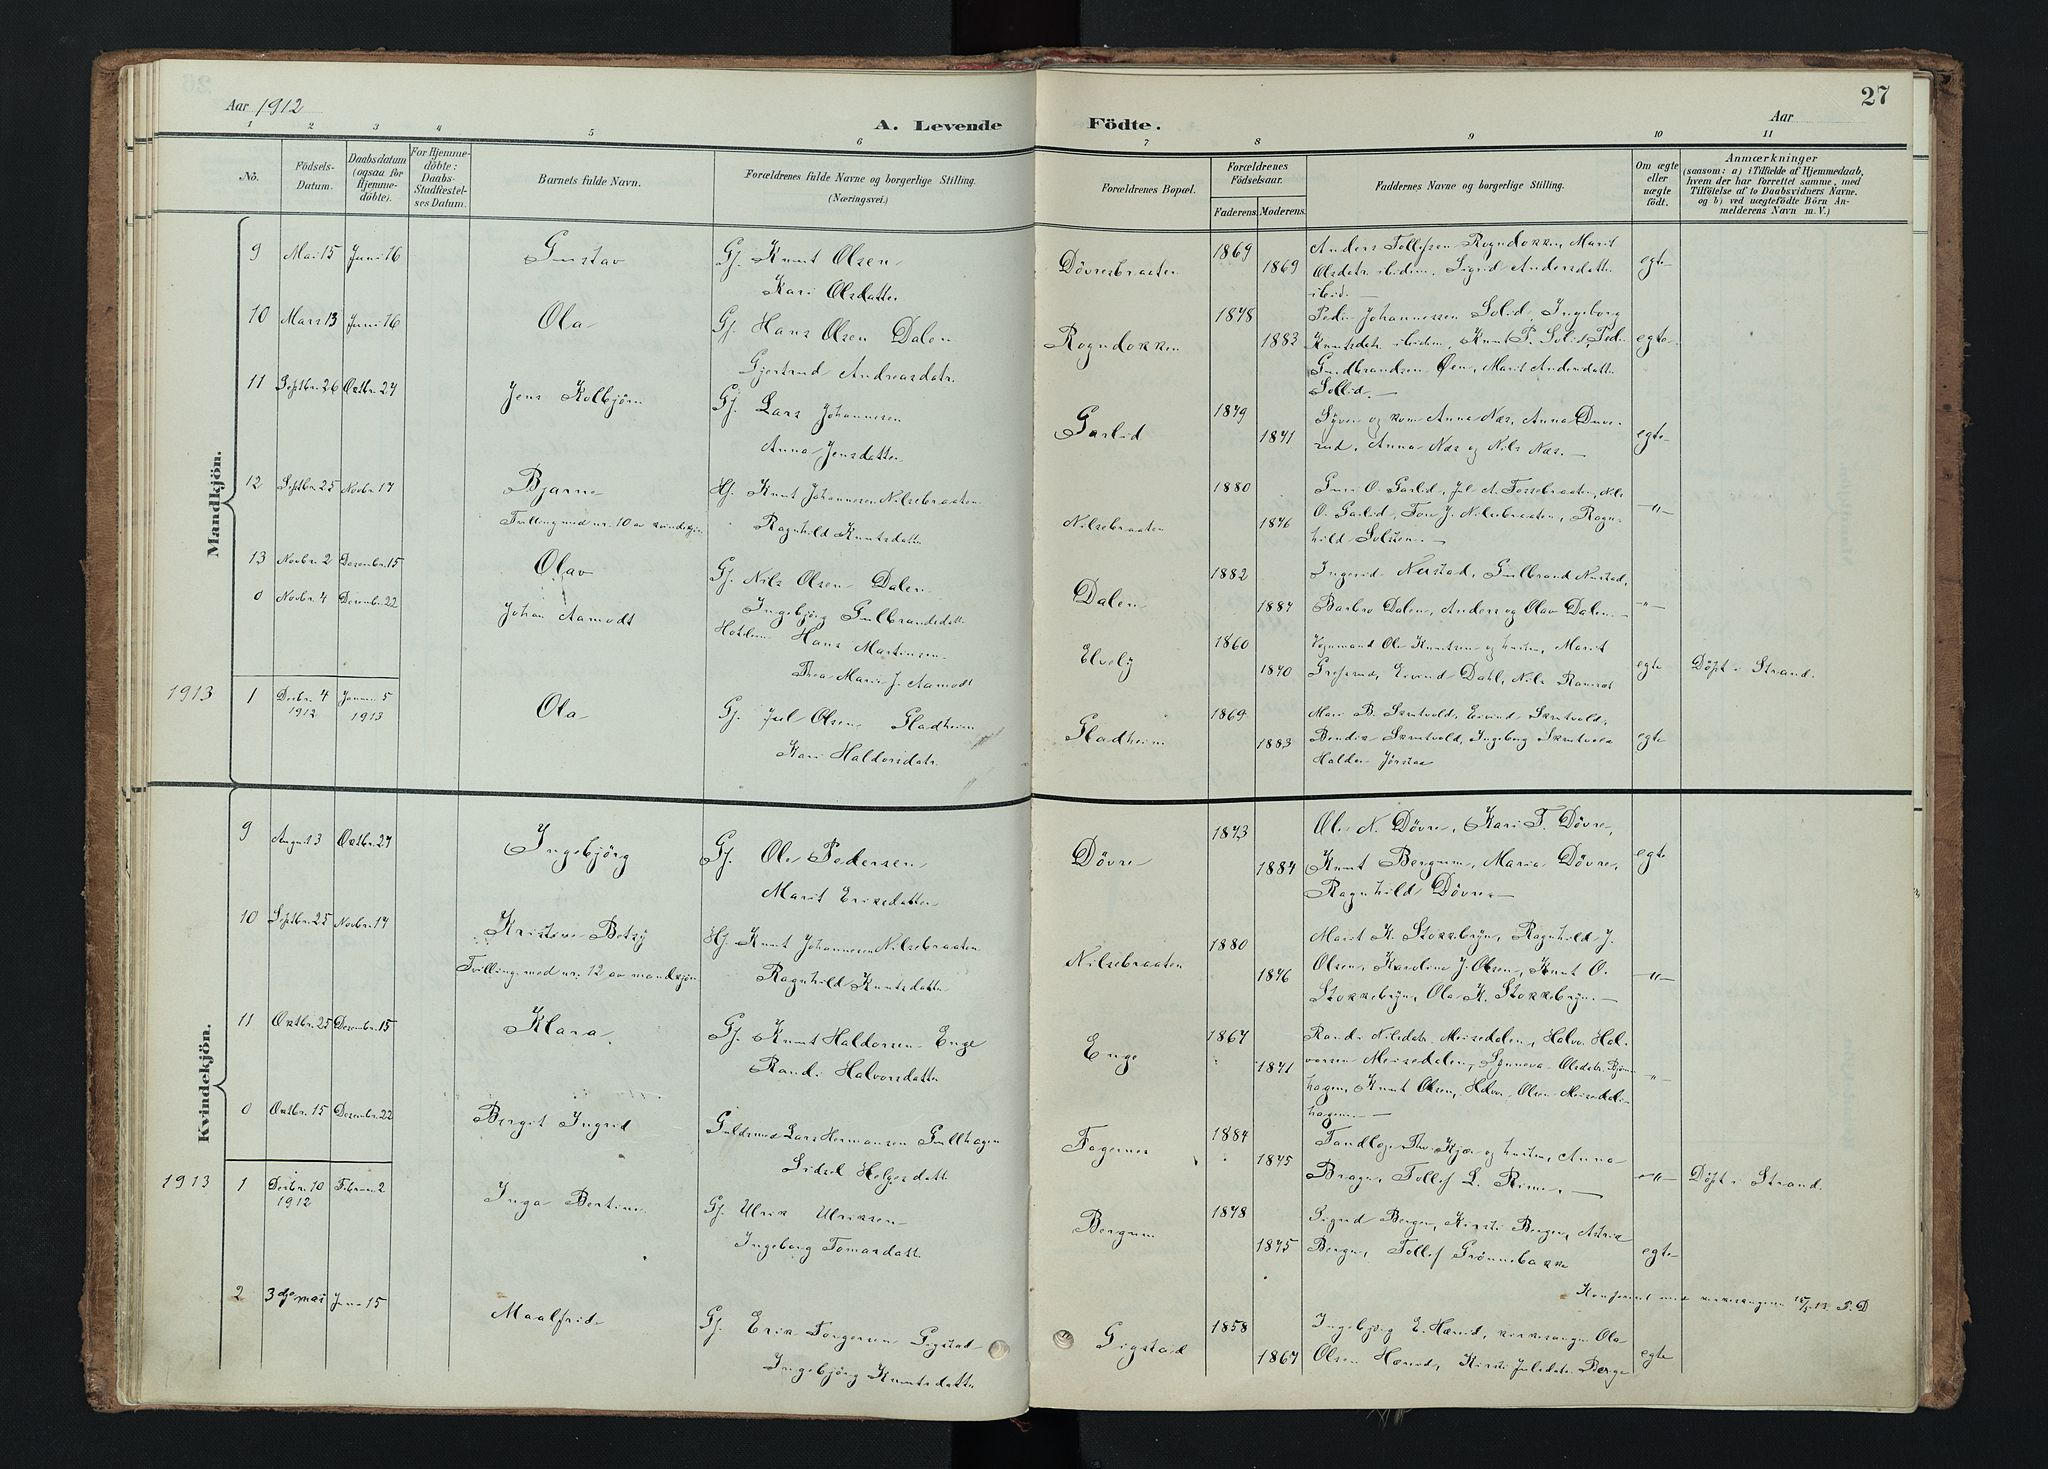 SAH, Nord-Aurdal prestekontor, Ministerialbok nr. 15, 1896-1914, s. 27